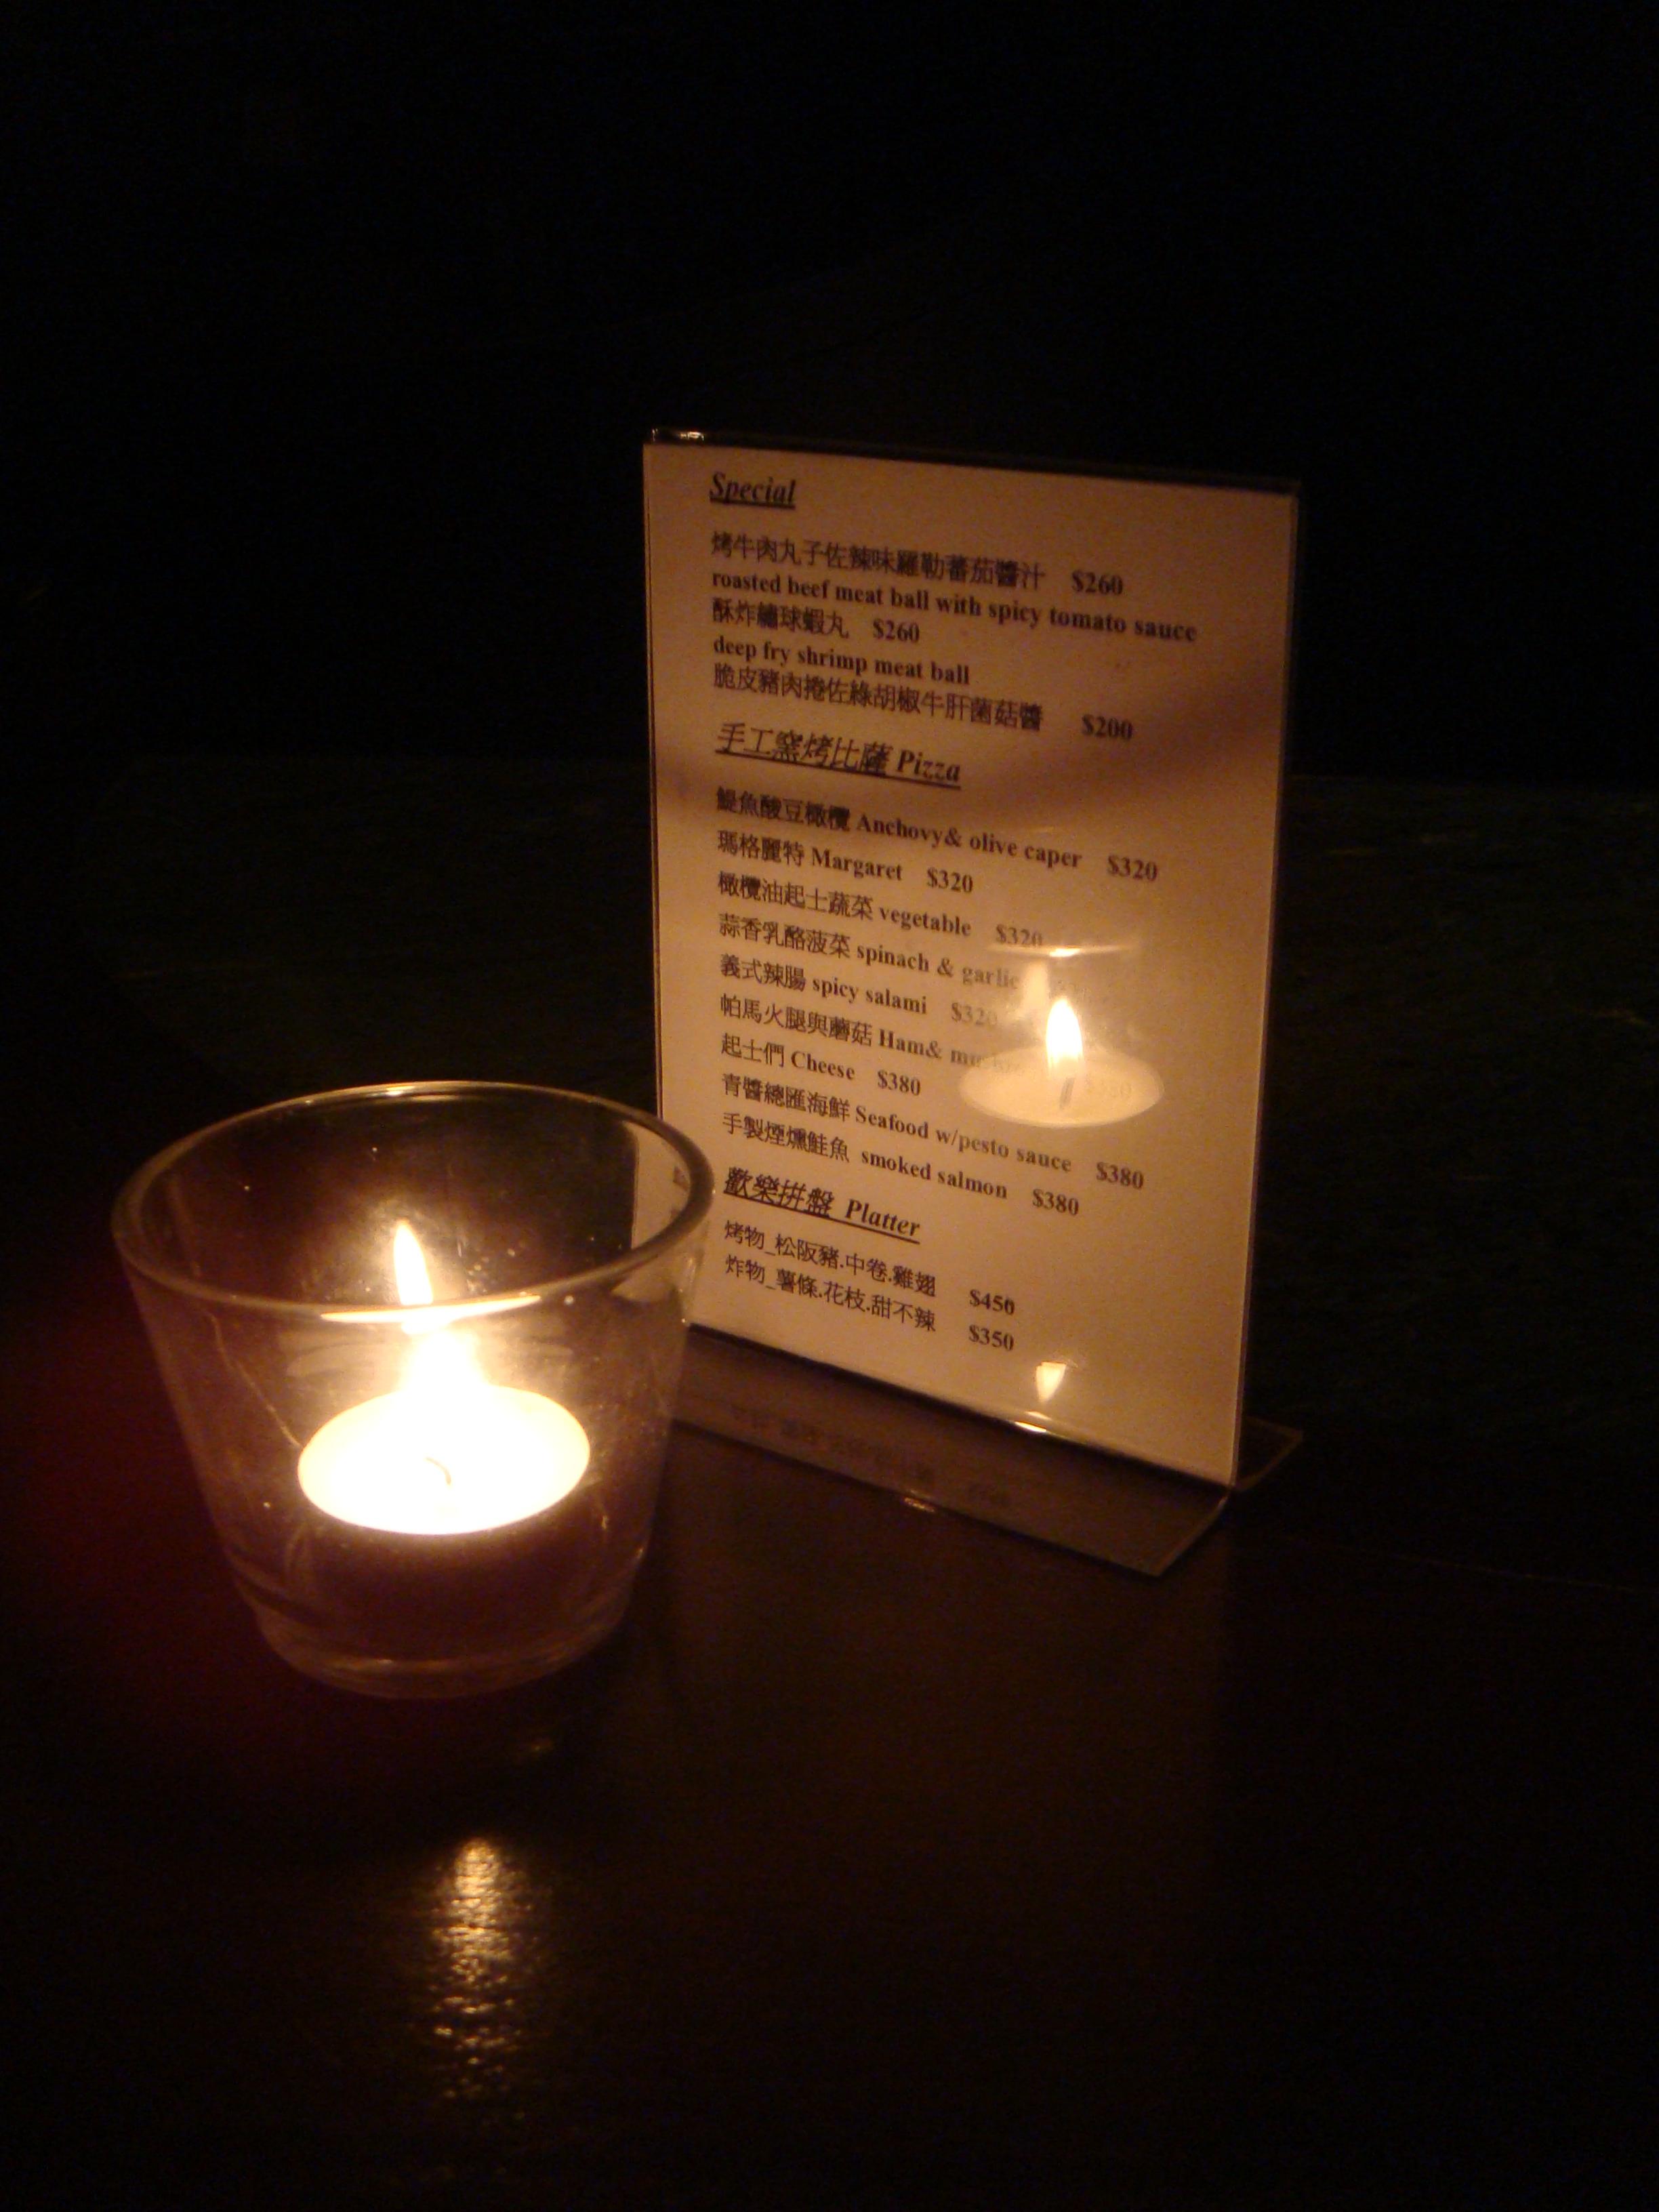 20110218-0219Marsalis Bar 馬沙里斯爵士酒館 燭光及推薦的餐點